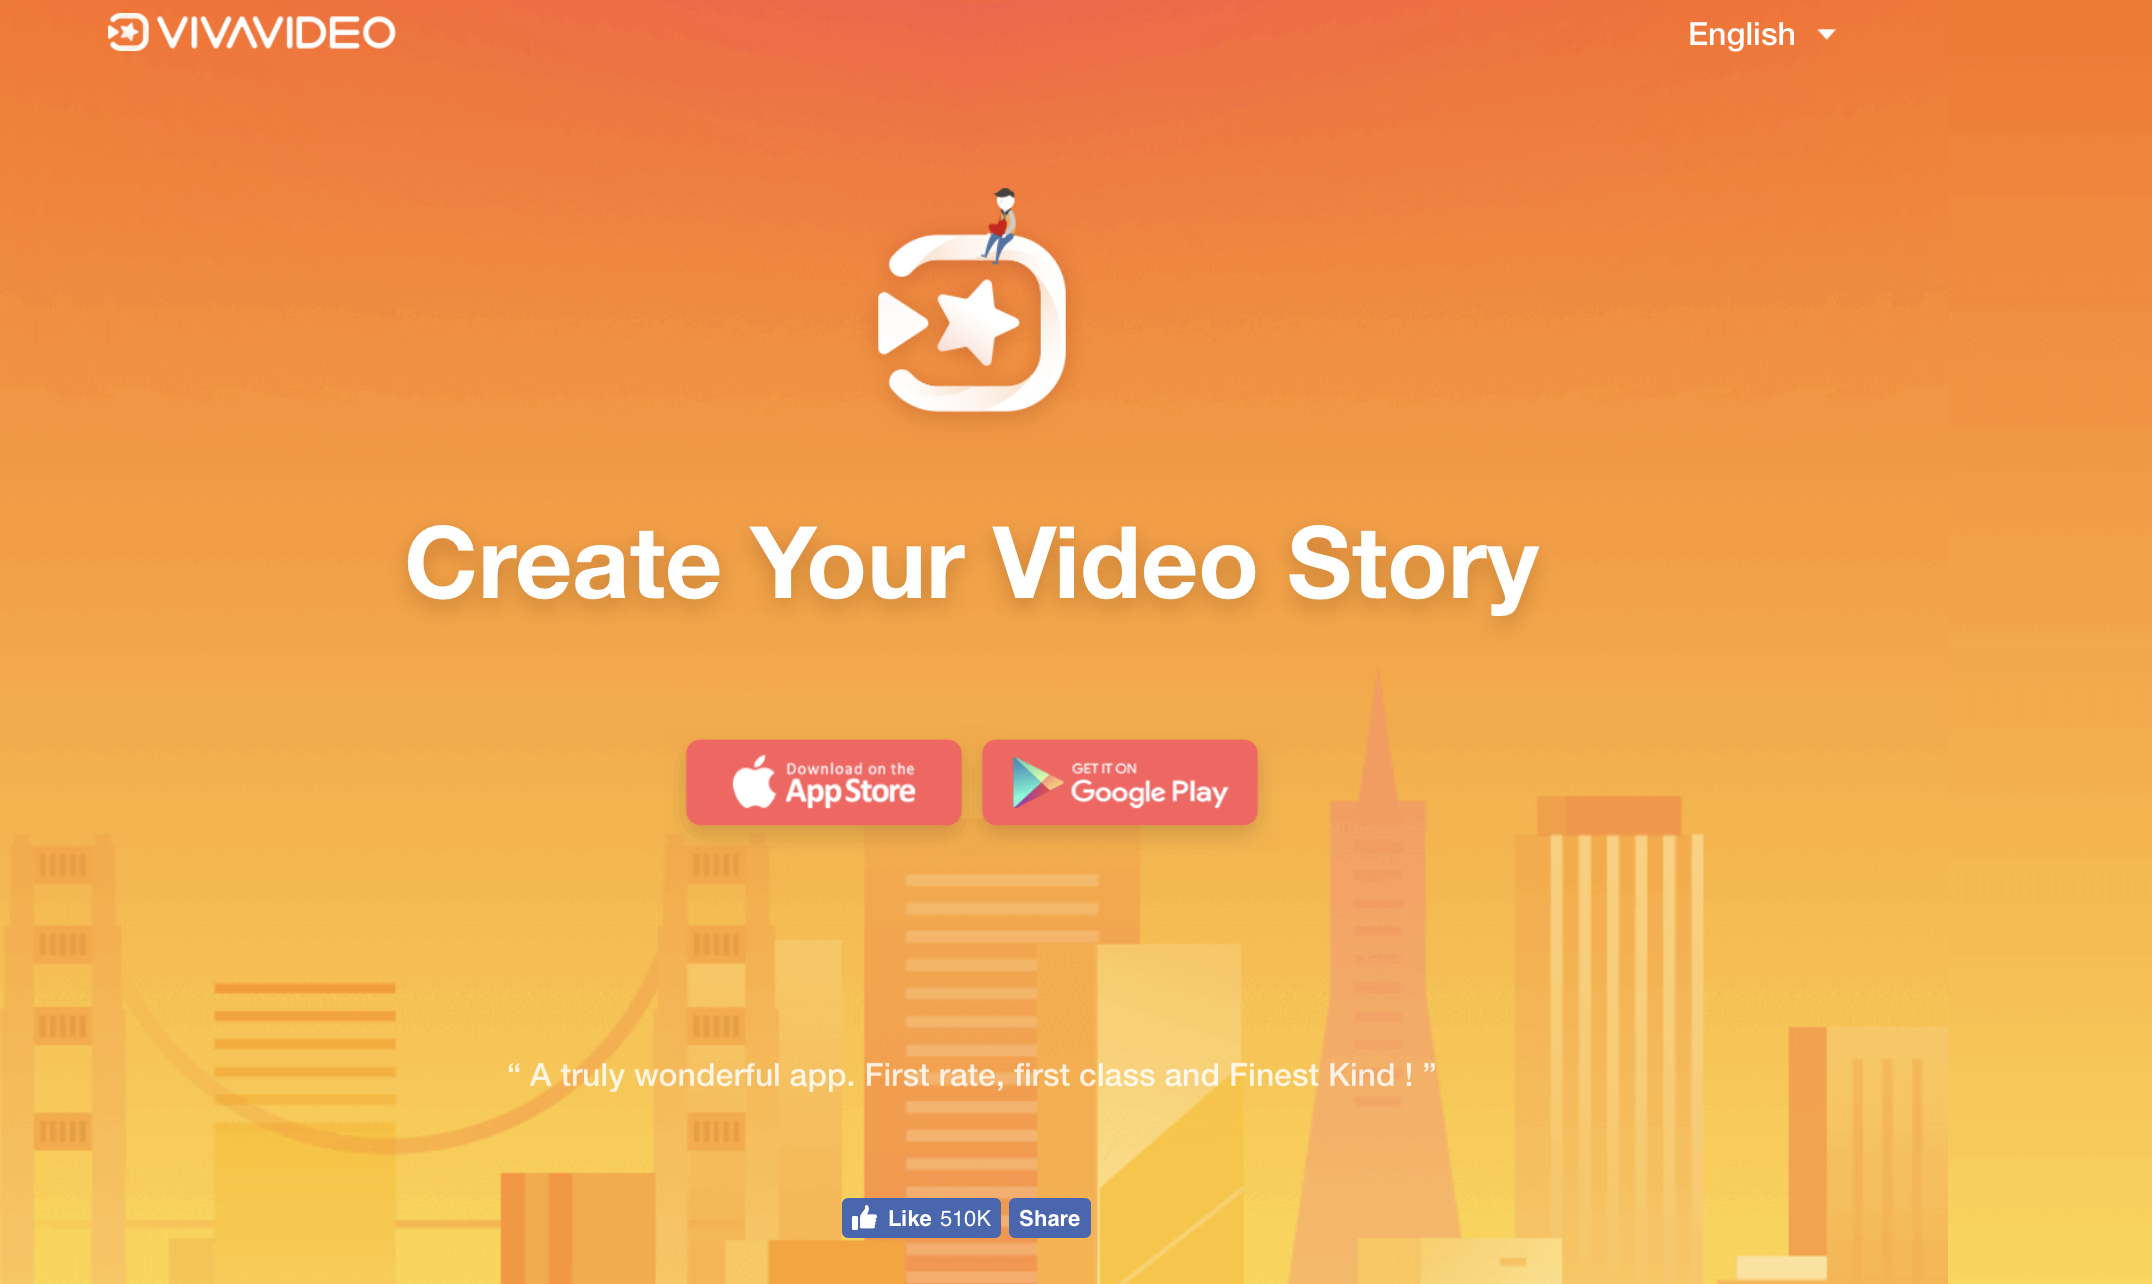 viva video apps download